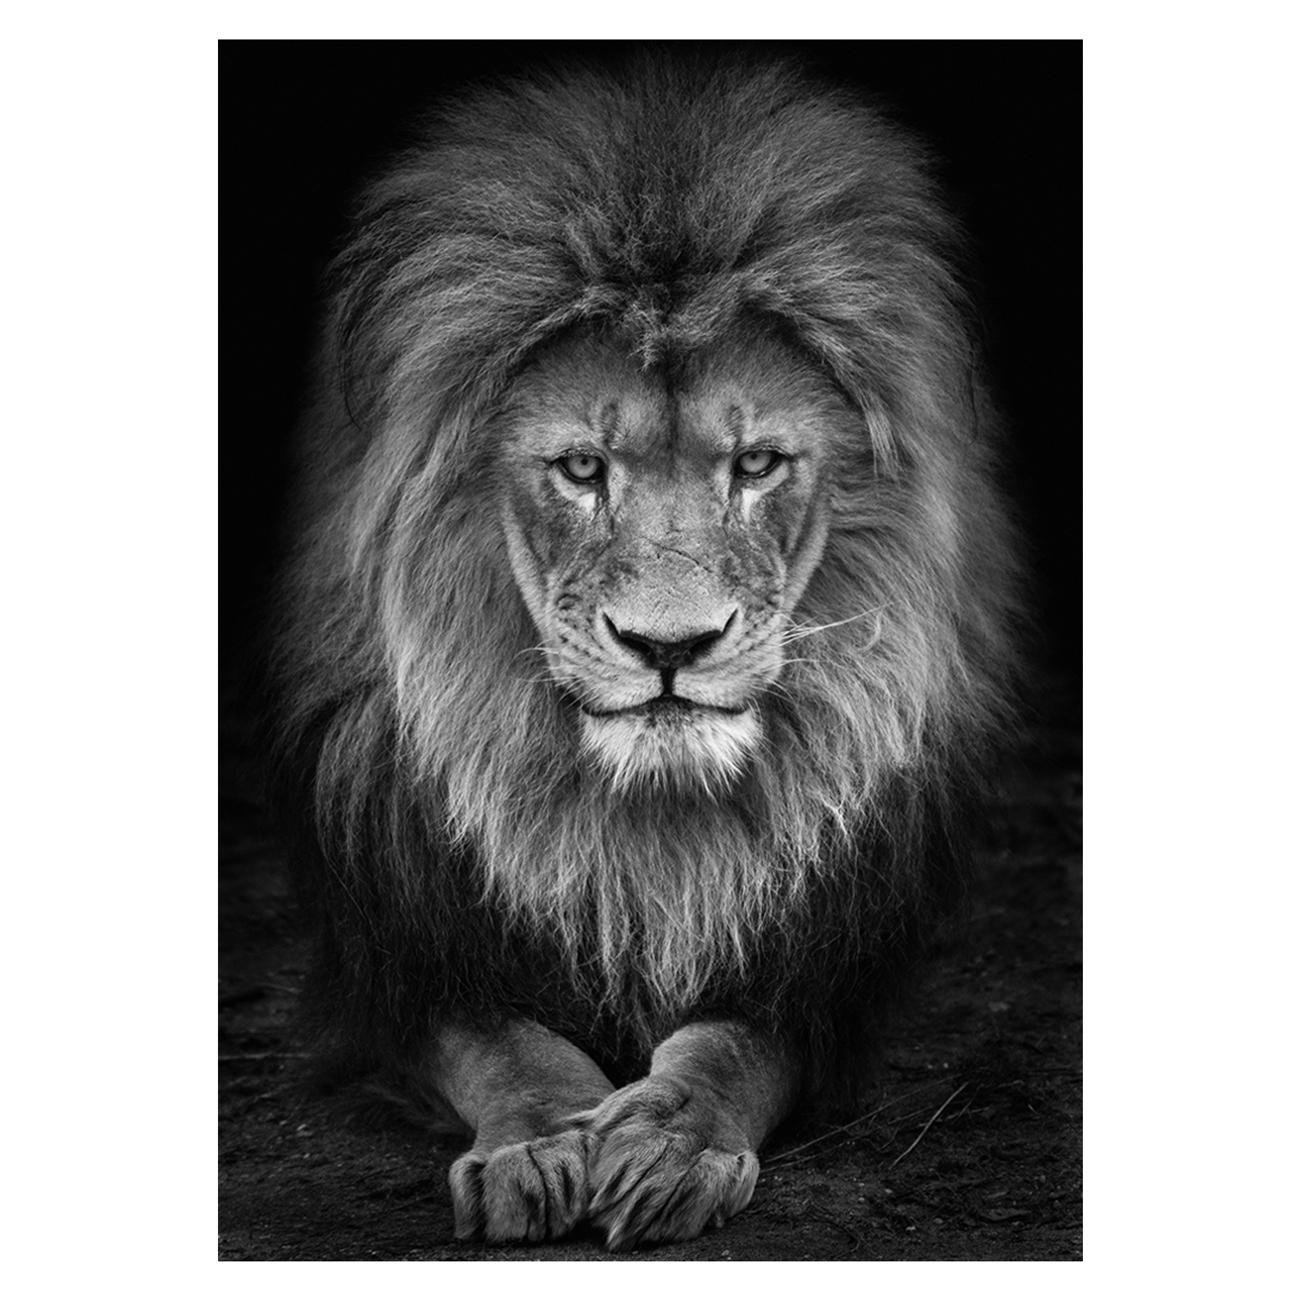 Wolf ademeit animal black and white fine art photography portrait zoo animals photographer fine art photography